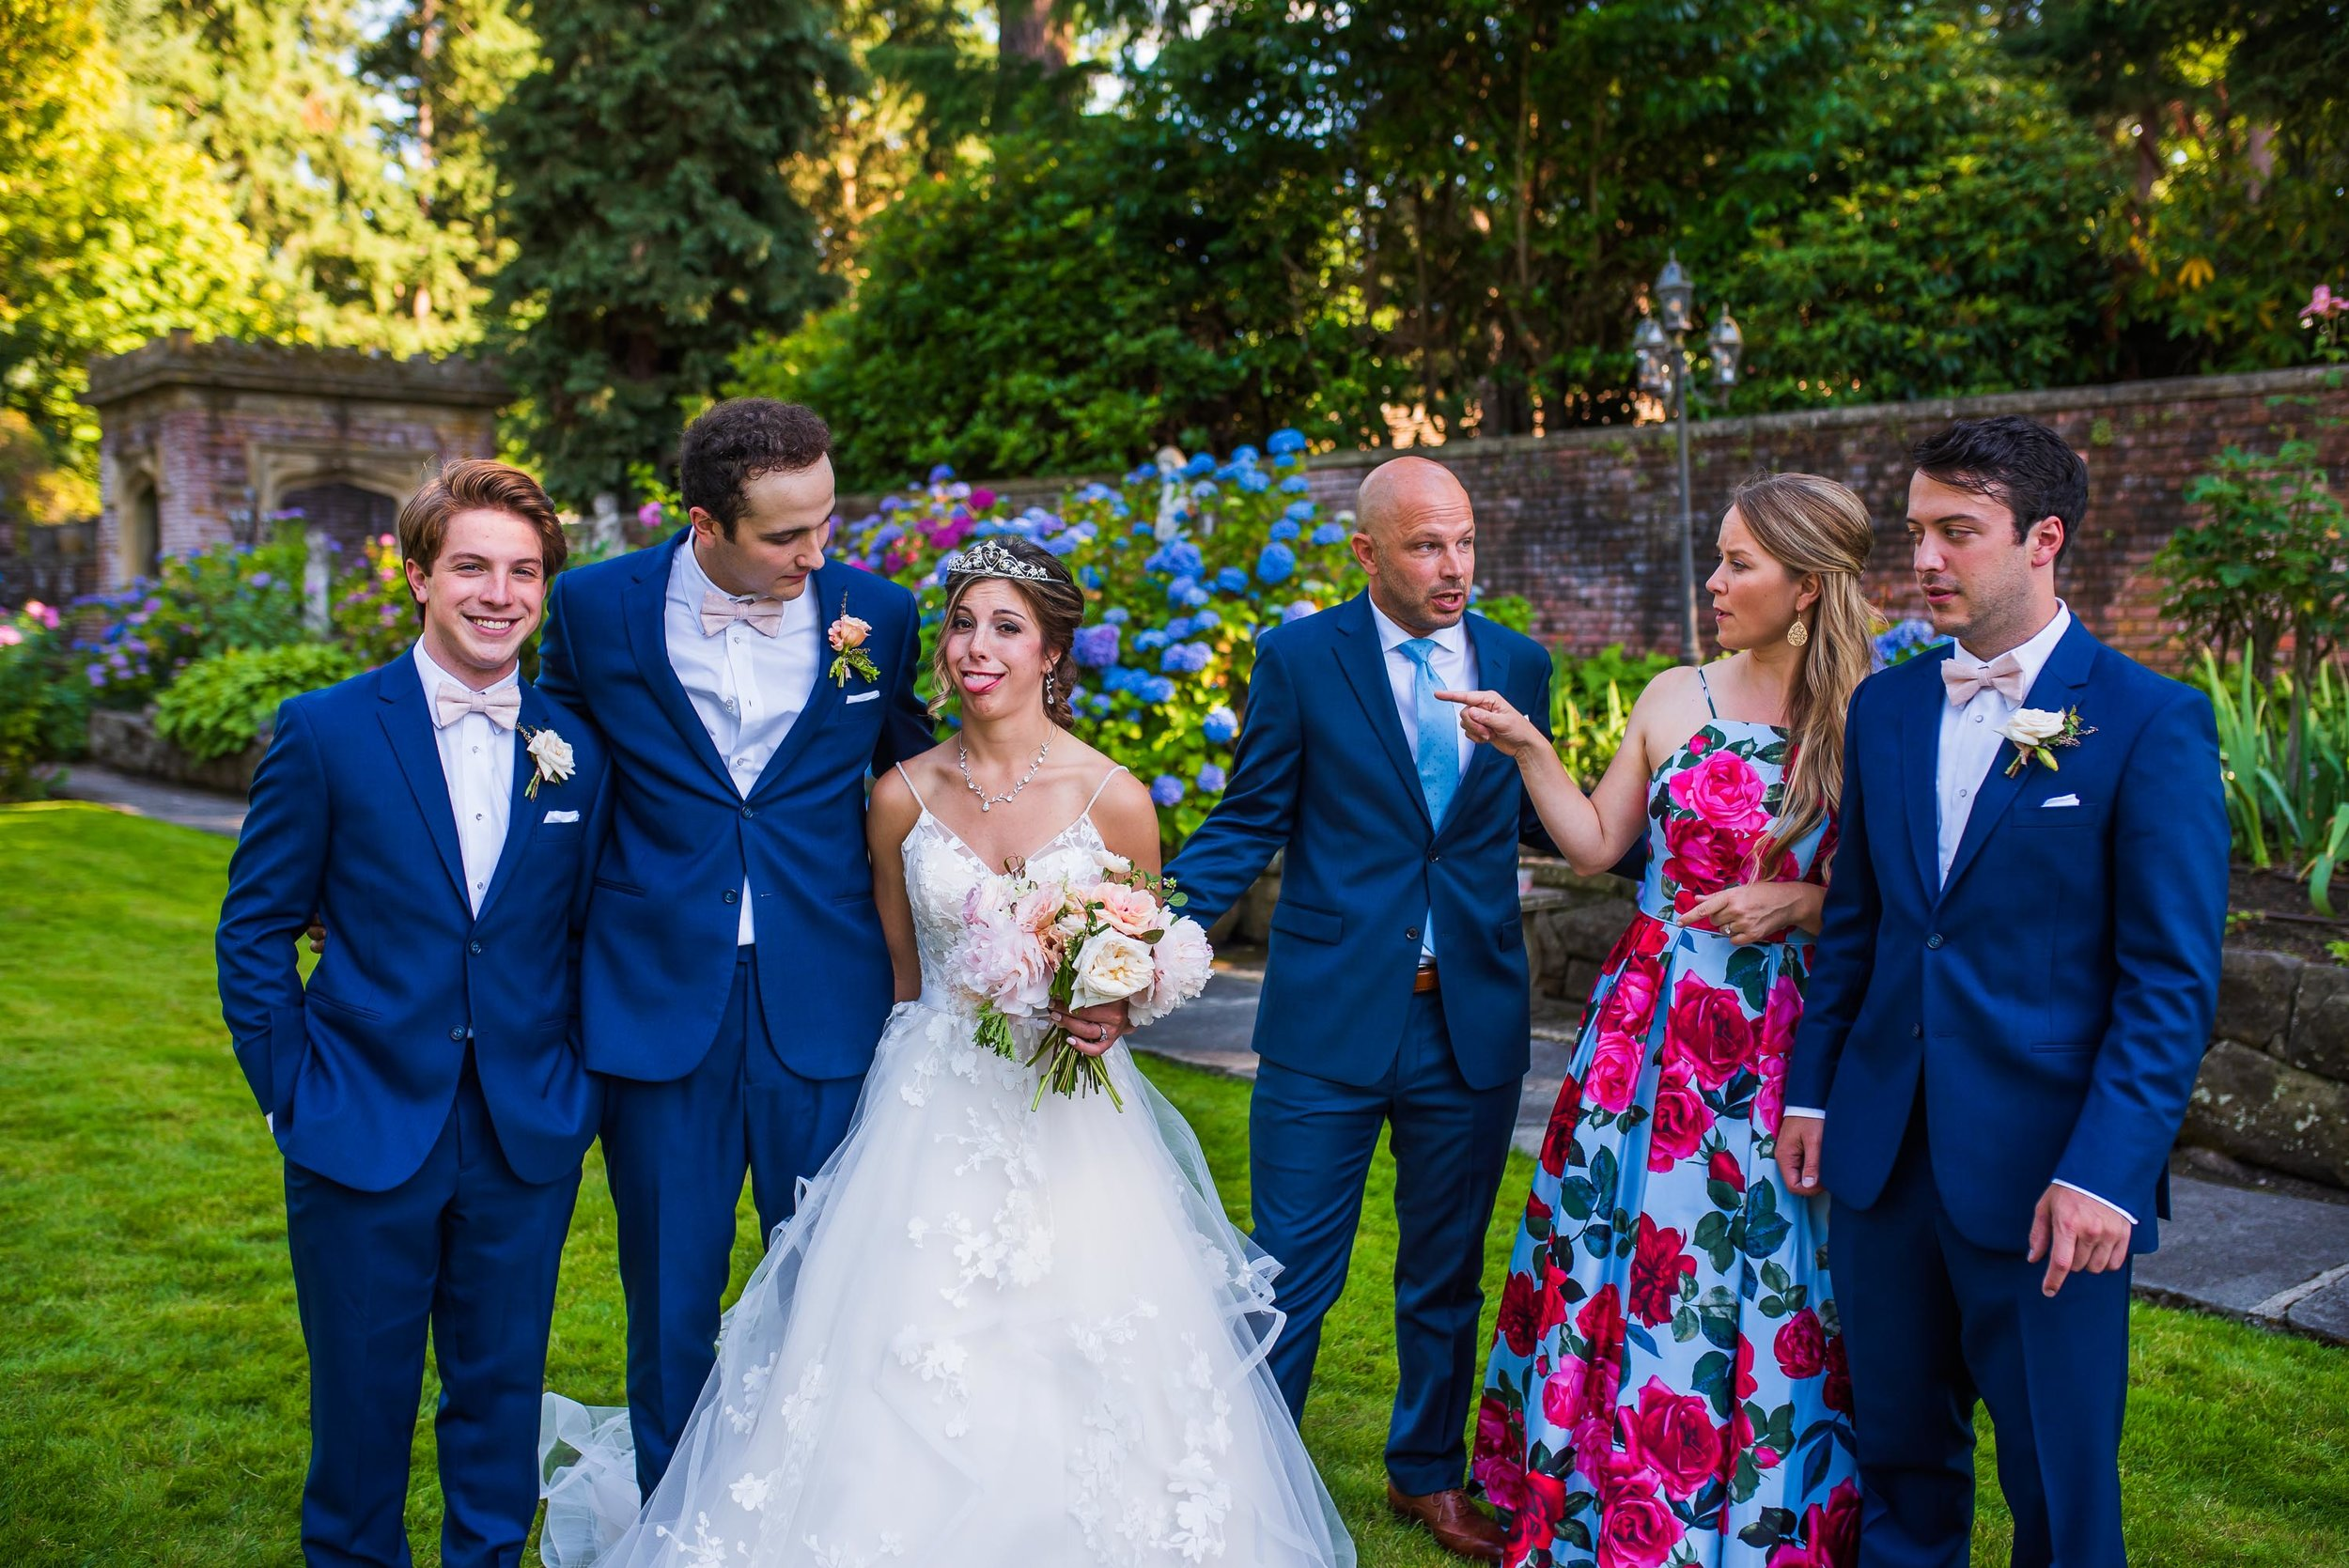 thornewood castle wedding 56.jpg